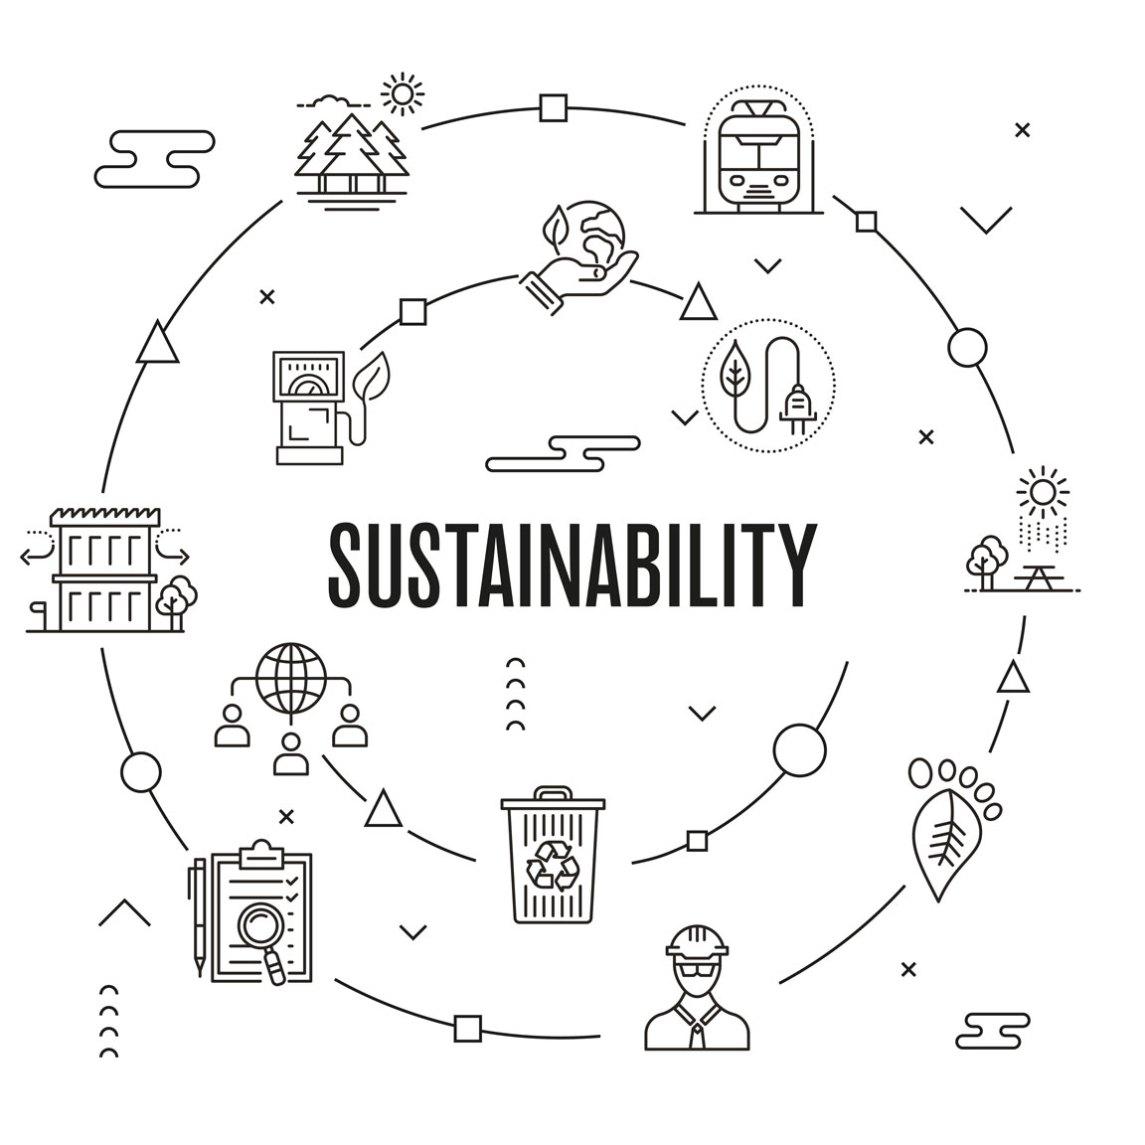 sustainability representation